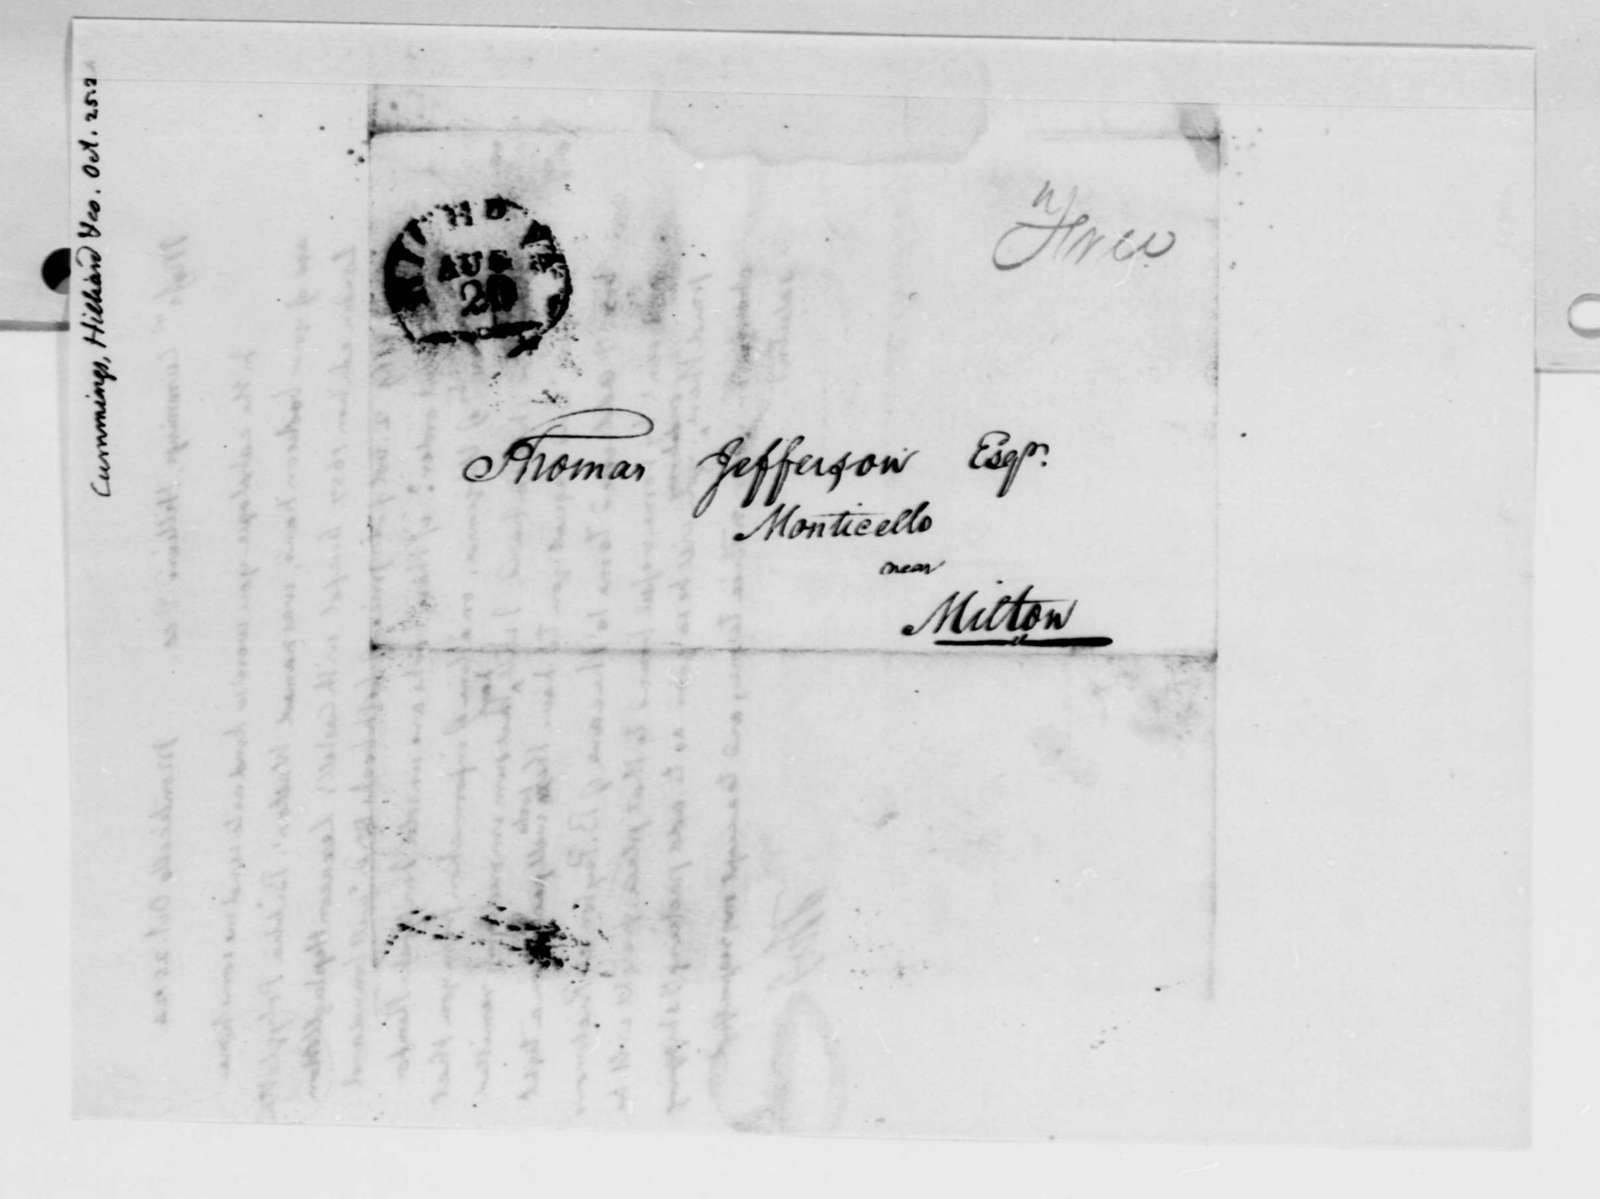 Thomas Jefferson to Cummings & Hillard, October 25, 1824